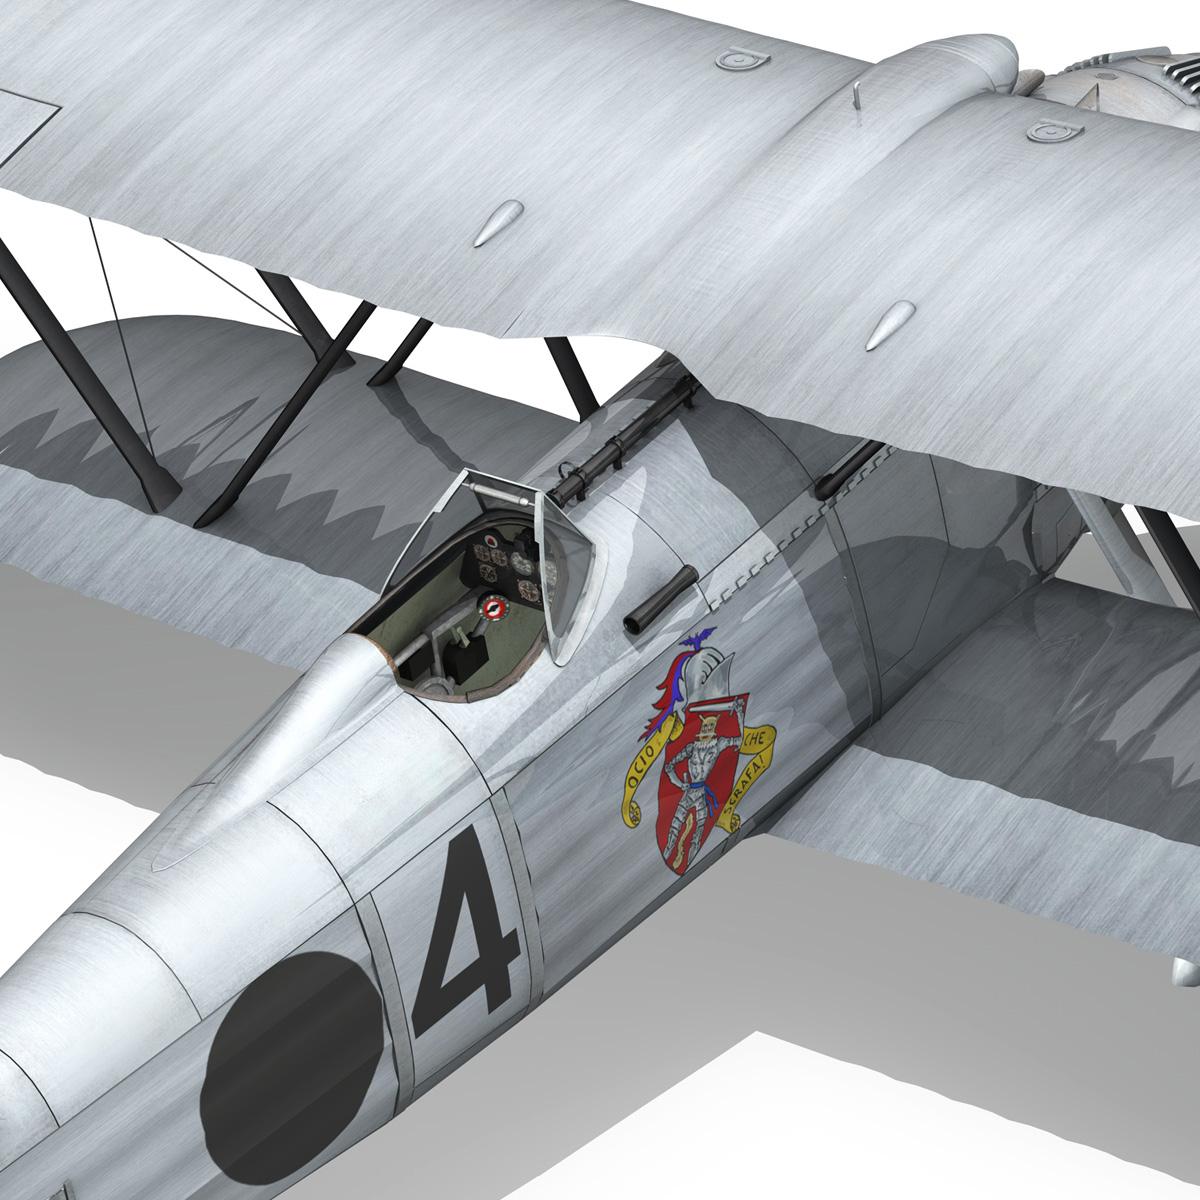 fiat cr.32 – italy air force – gruppo baleari 3d model fbx c4d lwo obj 252217